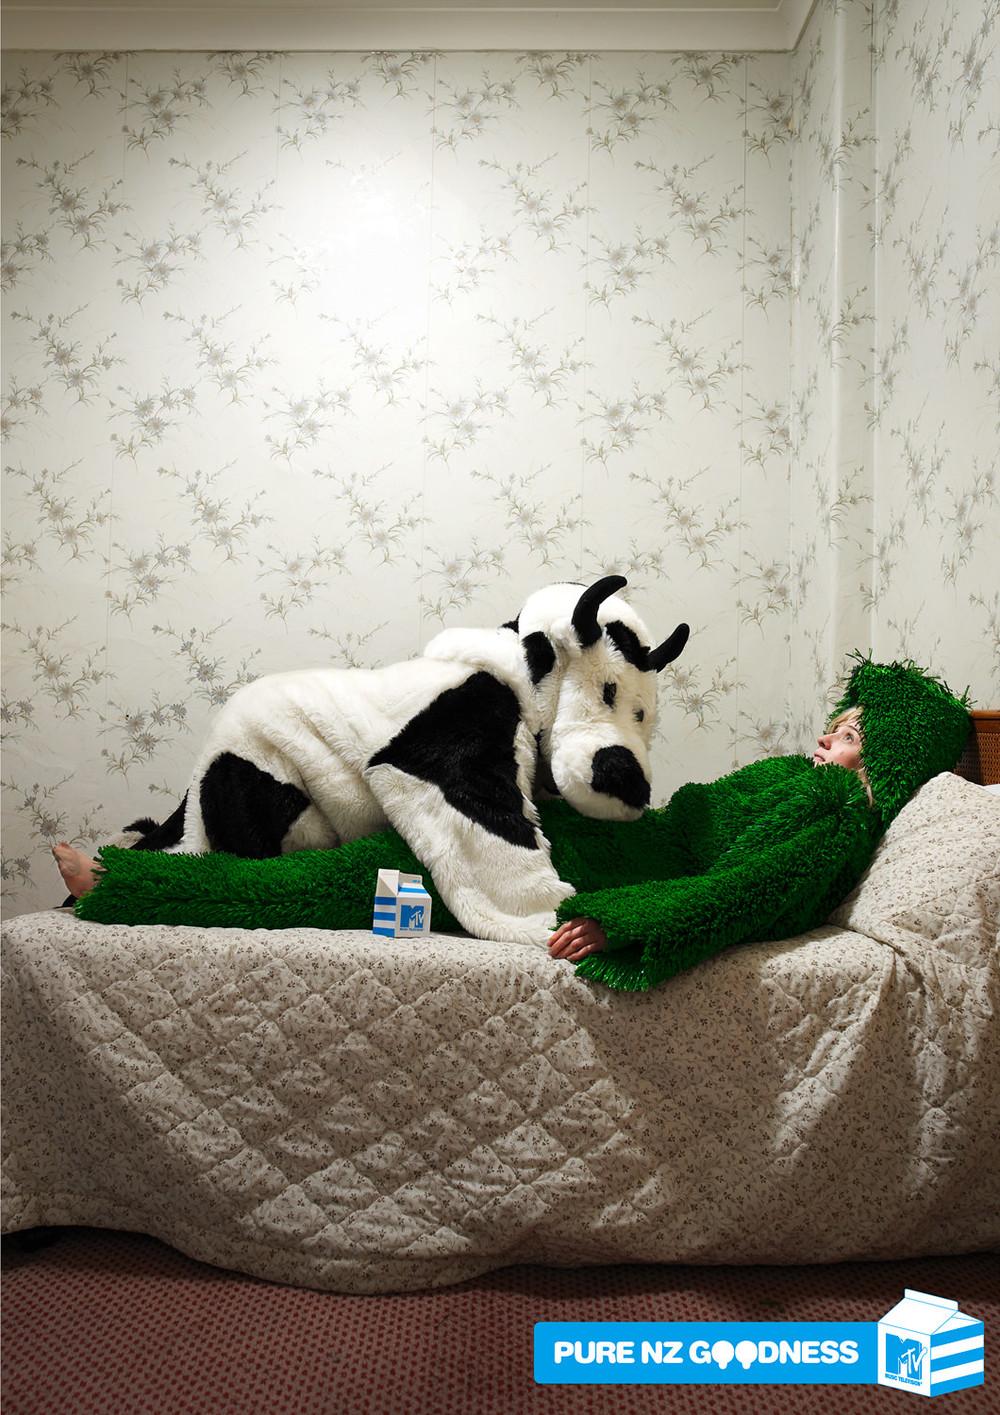 MTV-NZ-COW-GRASS-STEPHEN-STEWART.jpg